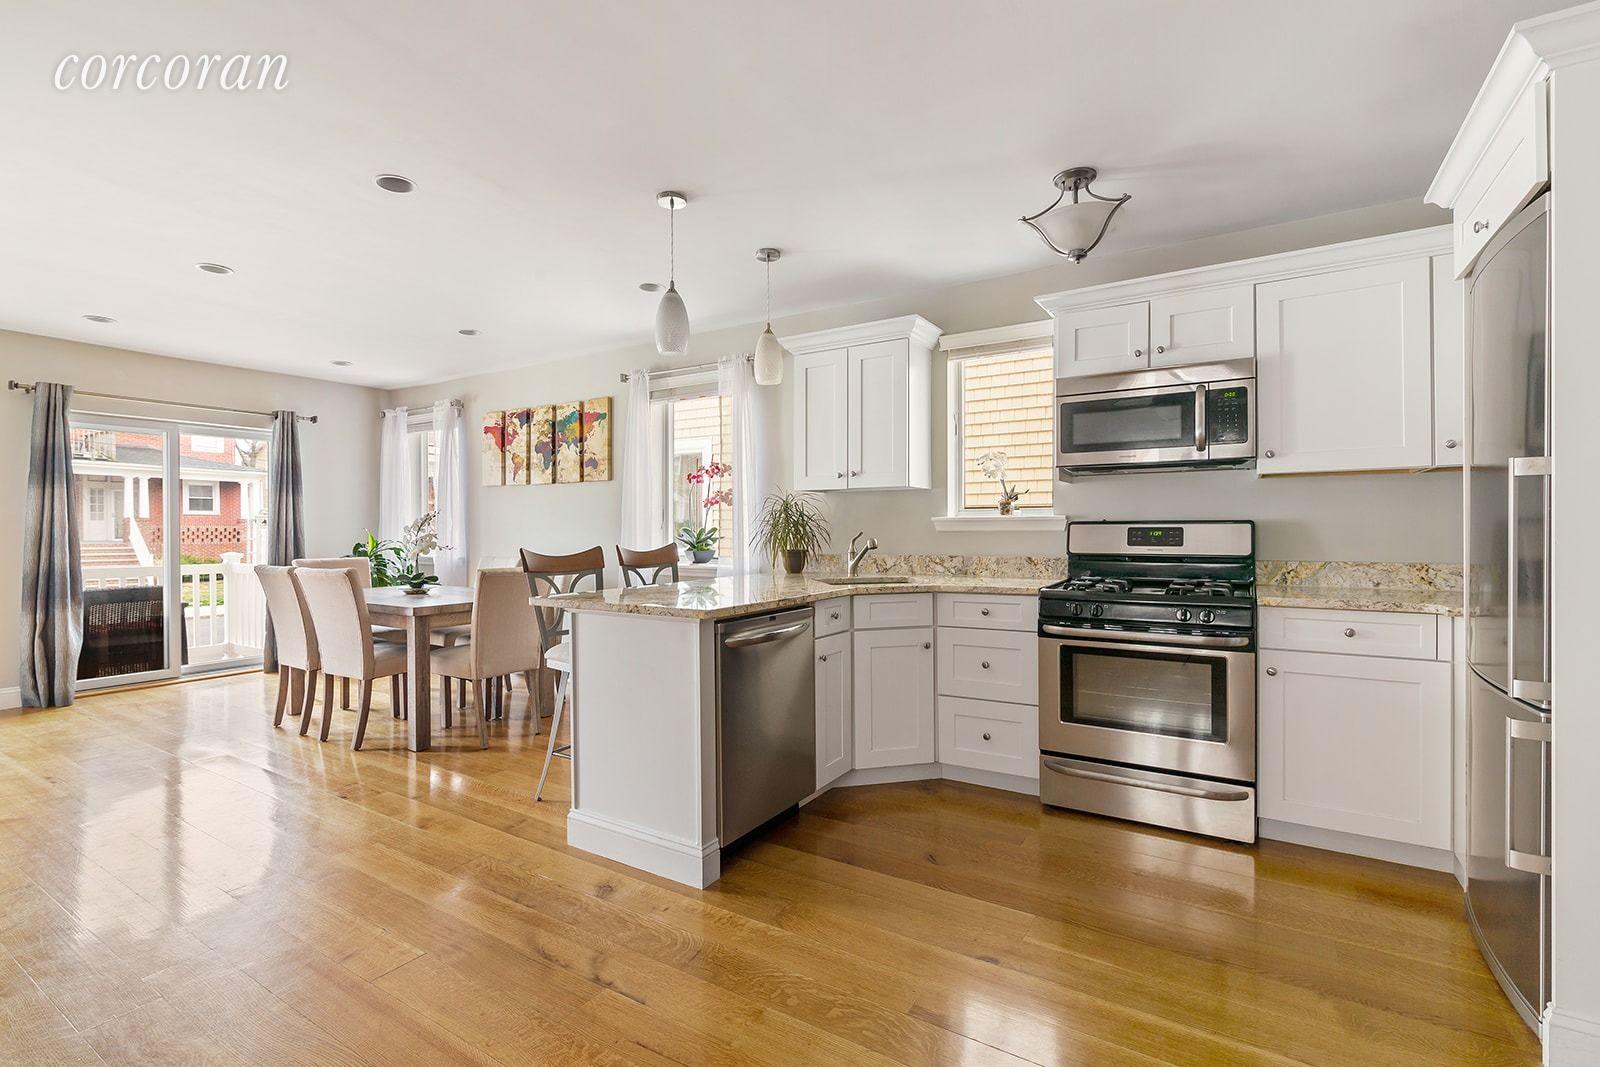 Apartment for sale at 182 Beach 125th Street, Apt 1G